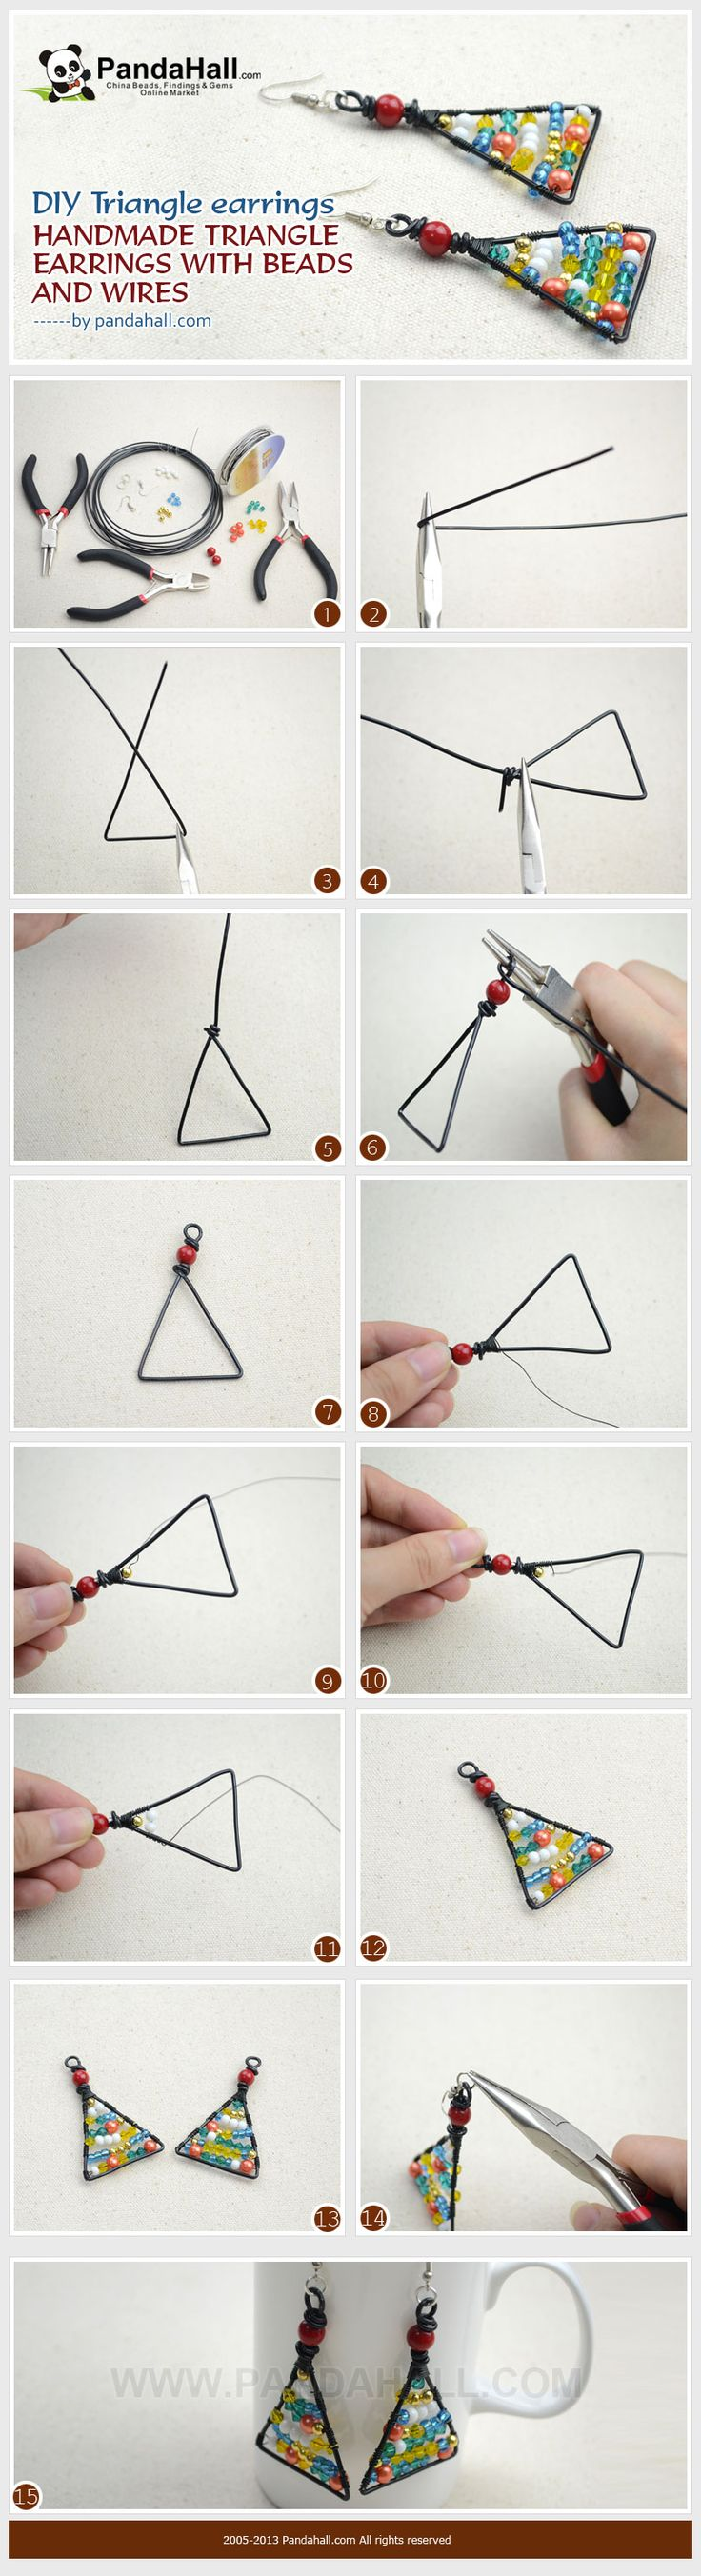 handmade jewelry, triangle earrings, making triangle earrings, DIY triangle earrings